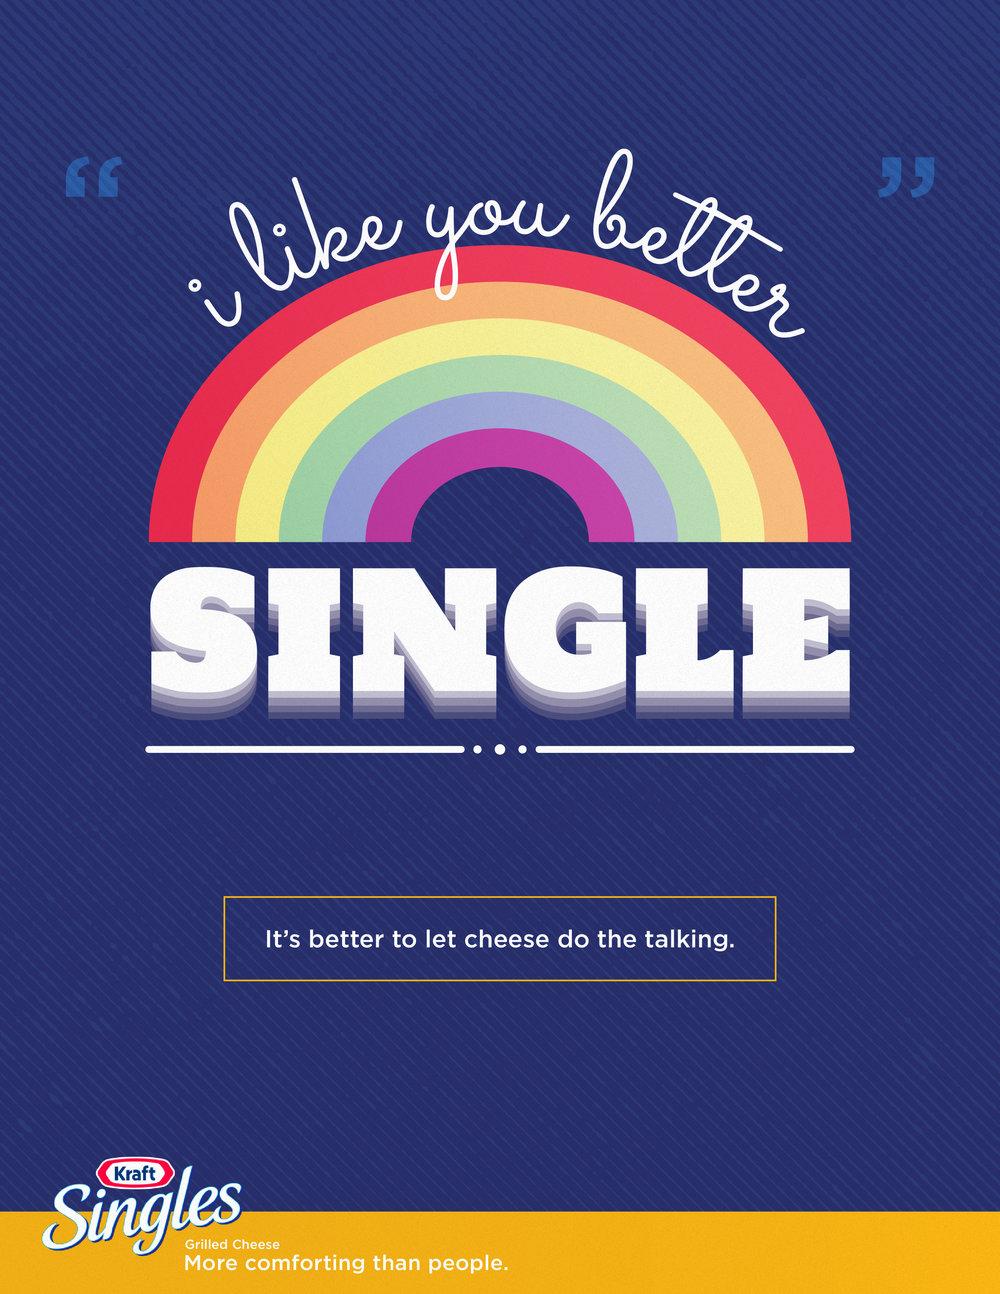 Kraft_Singles_Print-01.jpg